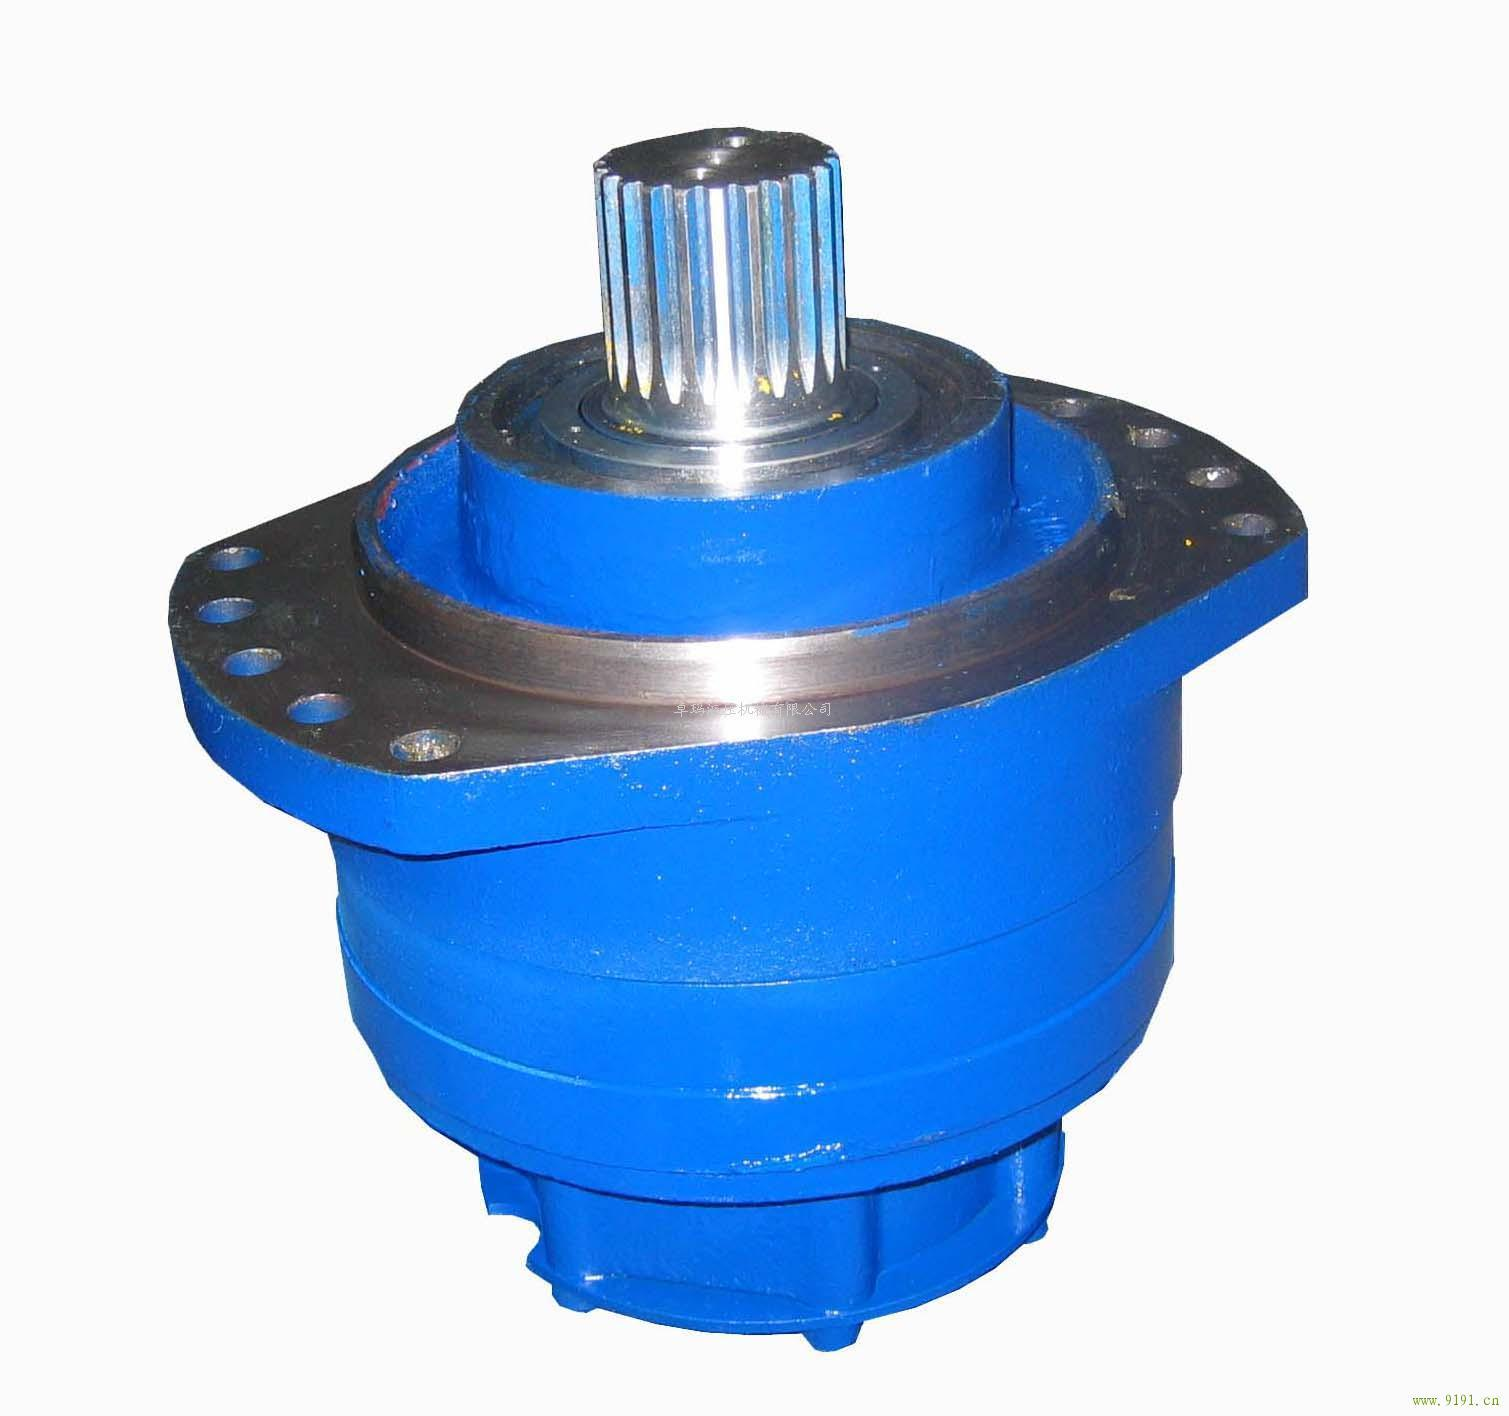 China Rexroth Mcs Hydraulic Piston Motor China Rexroth